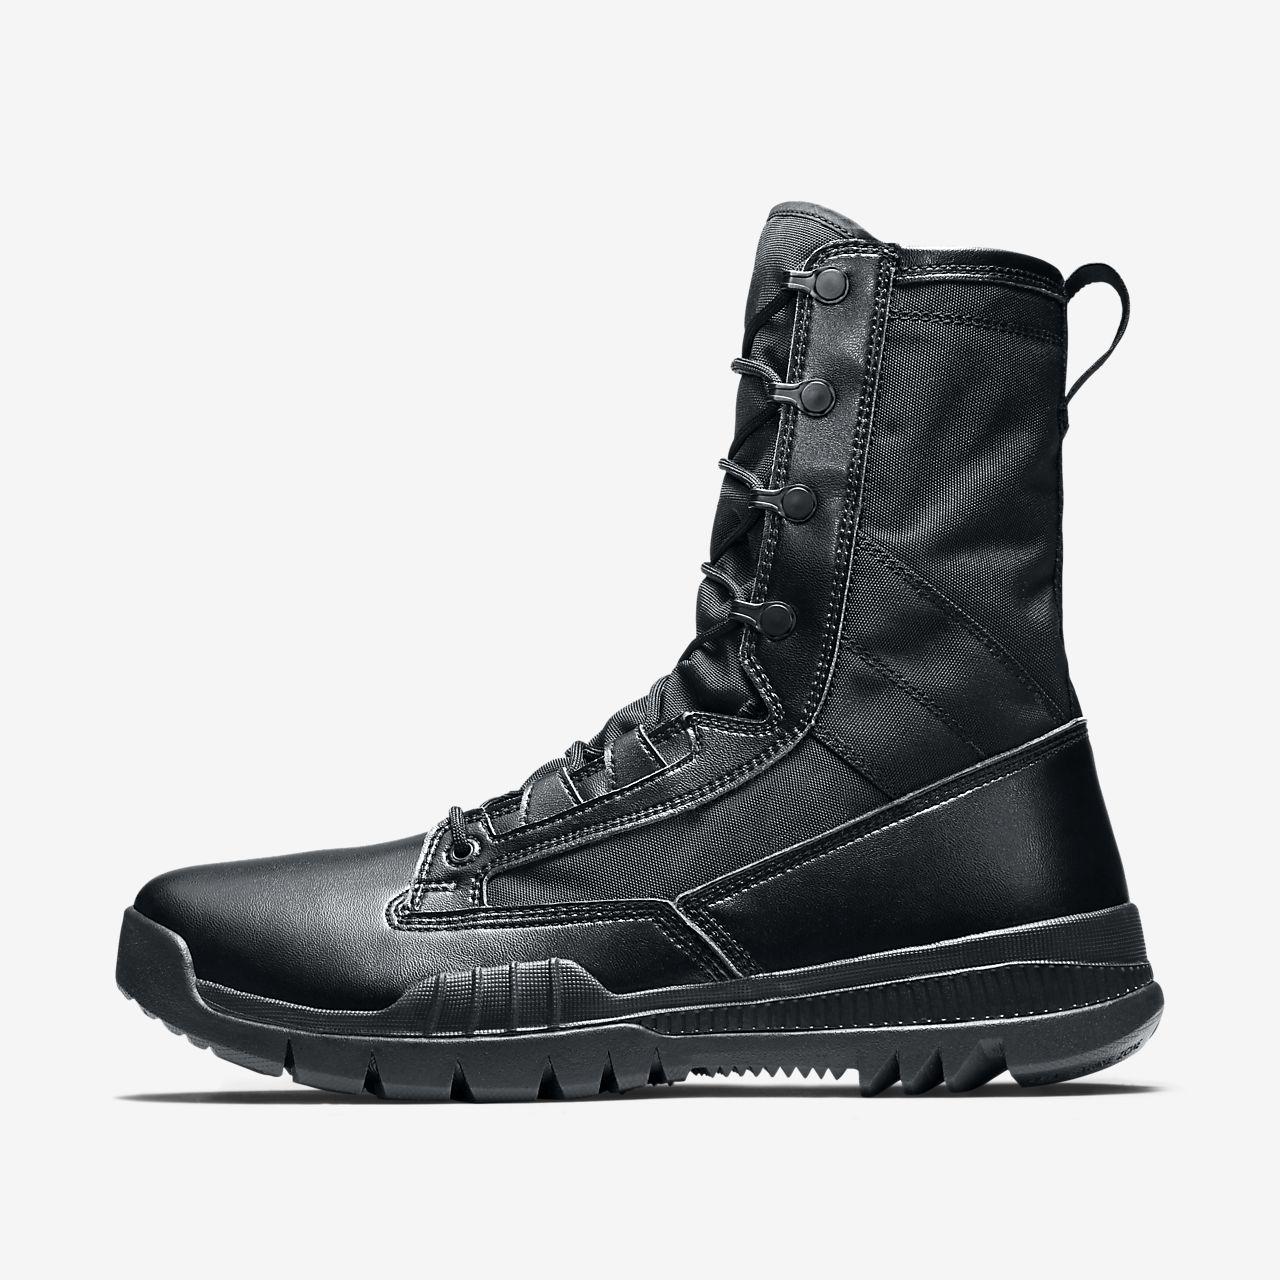 online retailer 94be8 3f6bb nike sfb black new hampshire